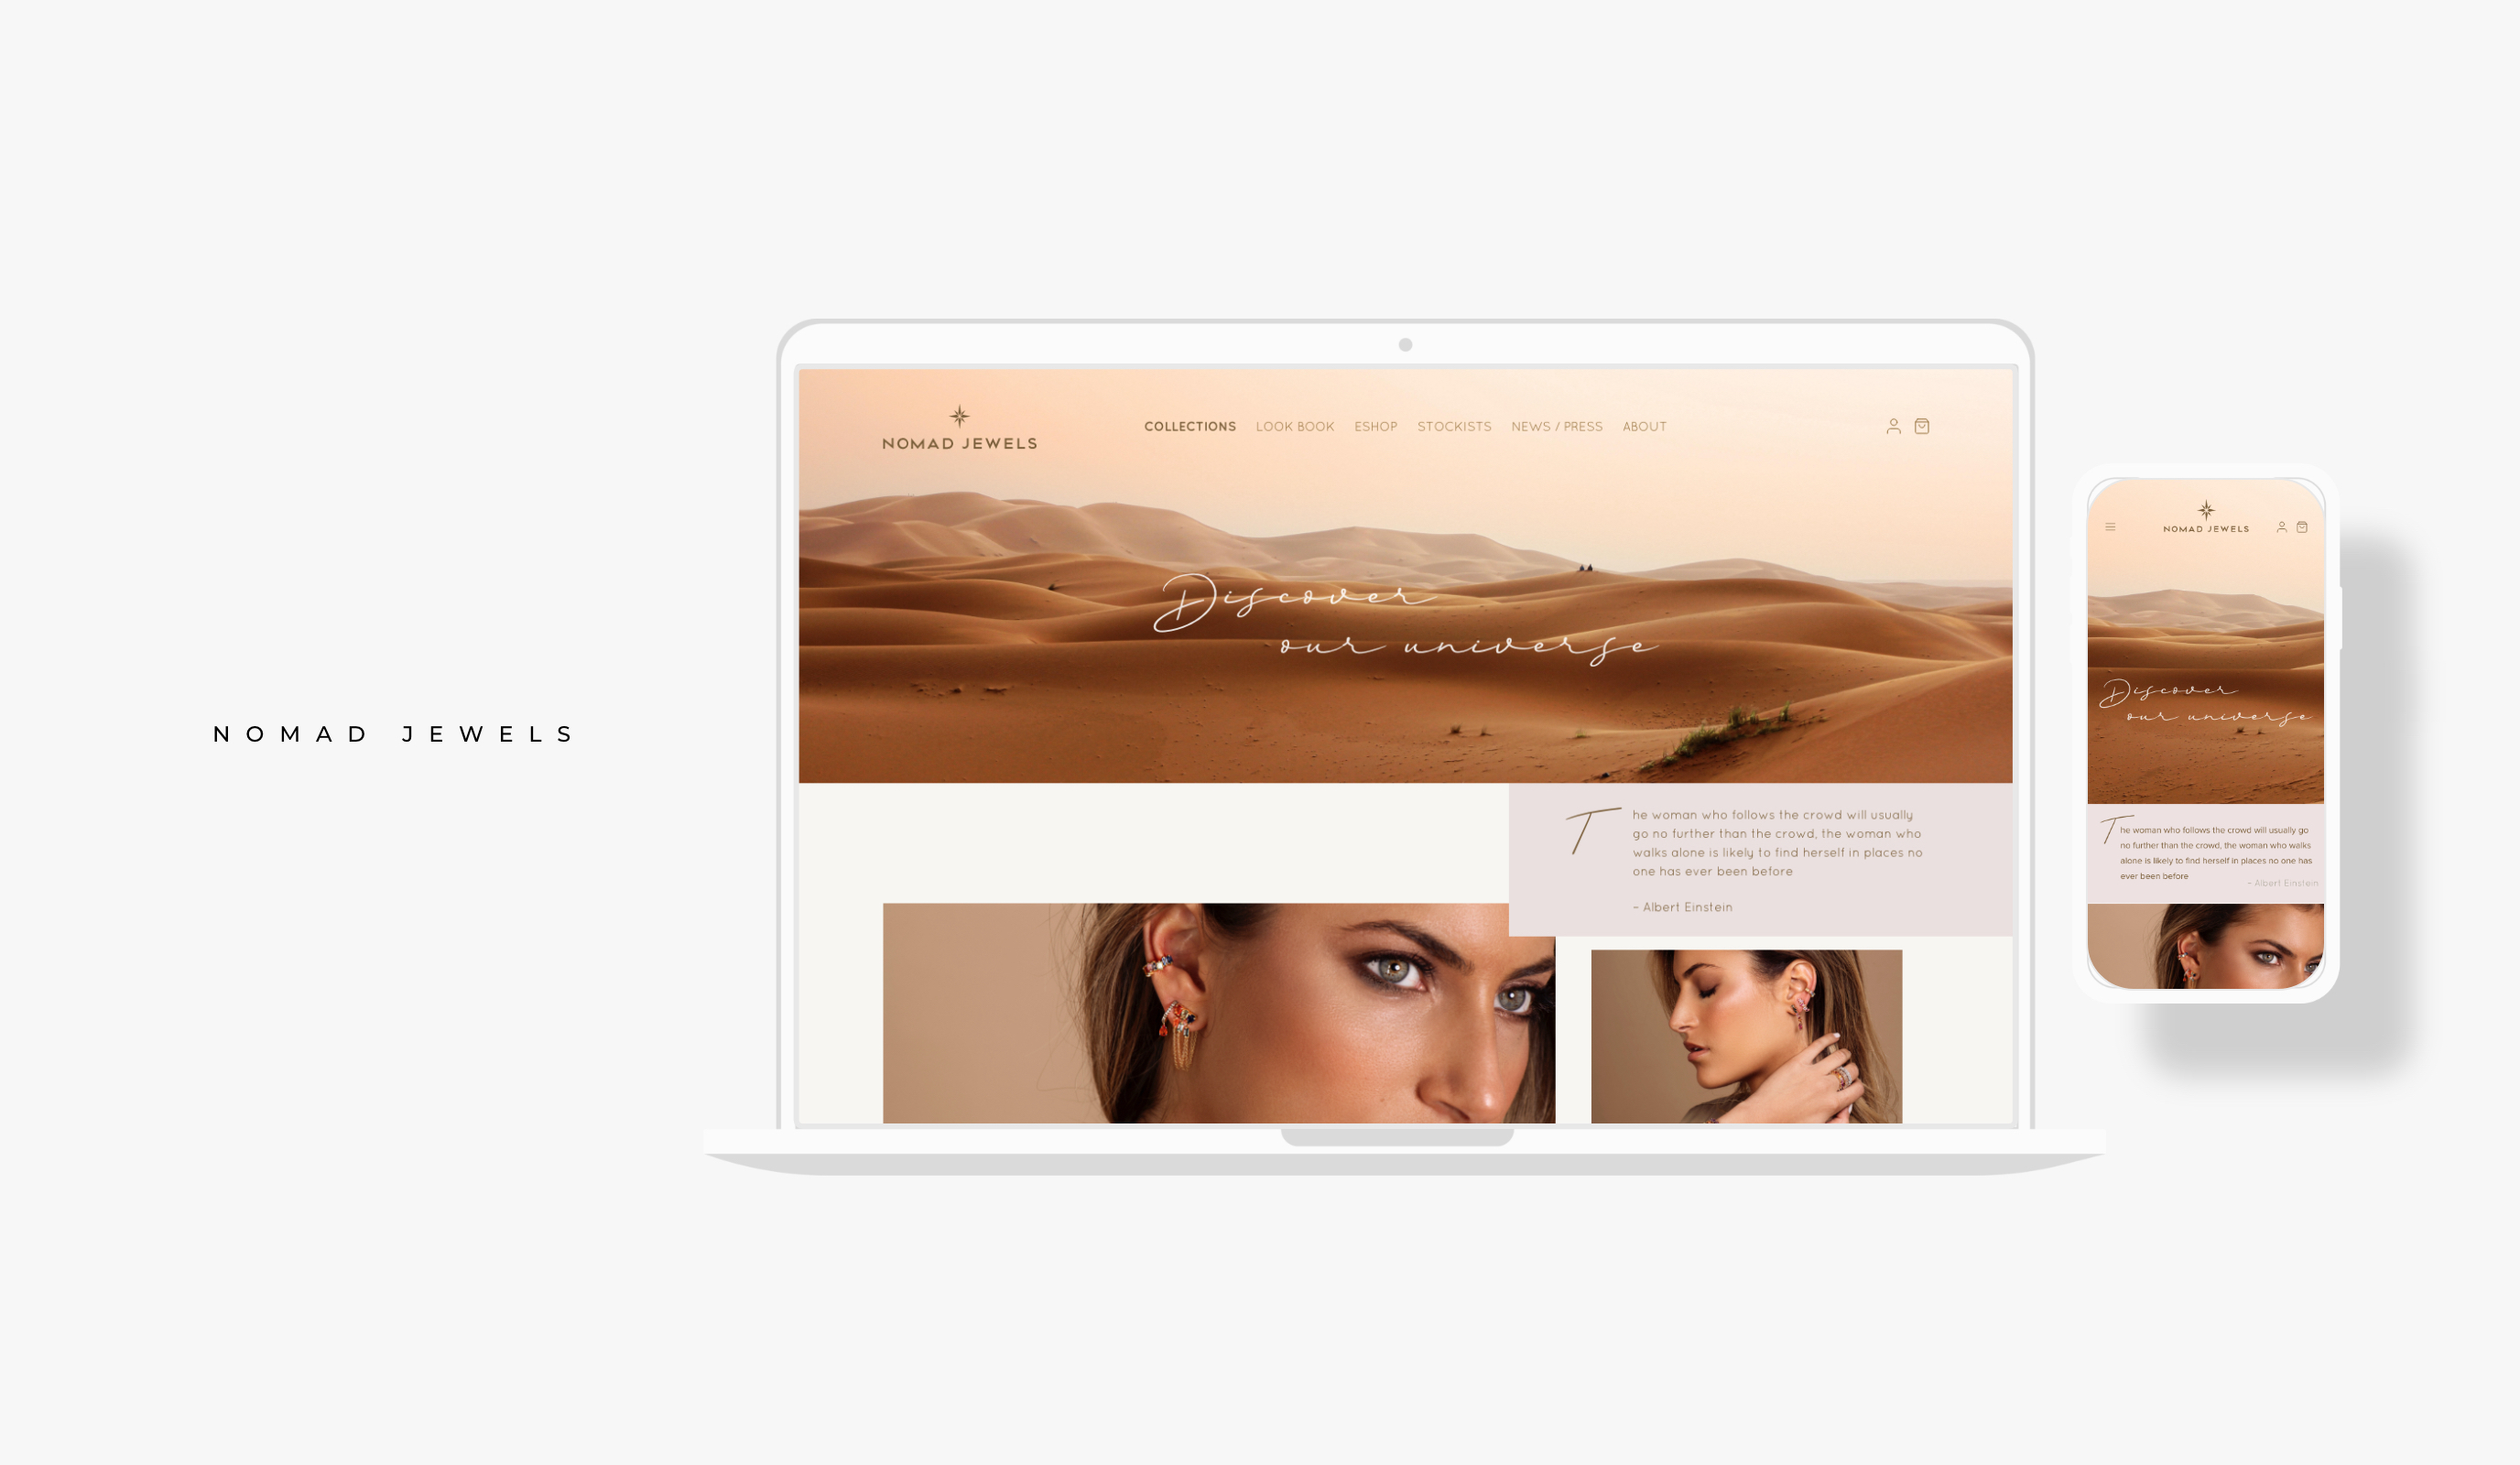 Nomad Jewels - Stratégie digitale